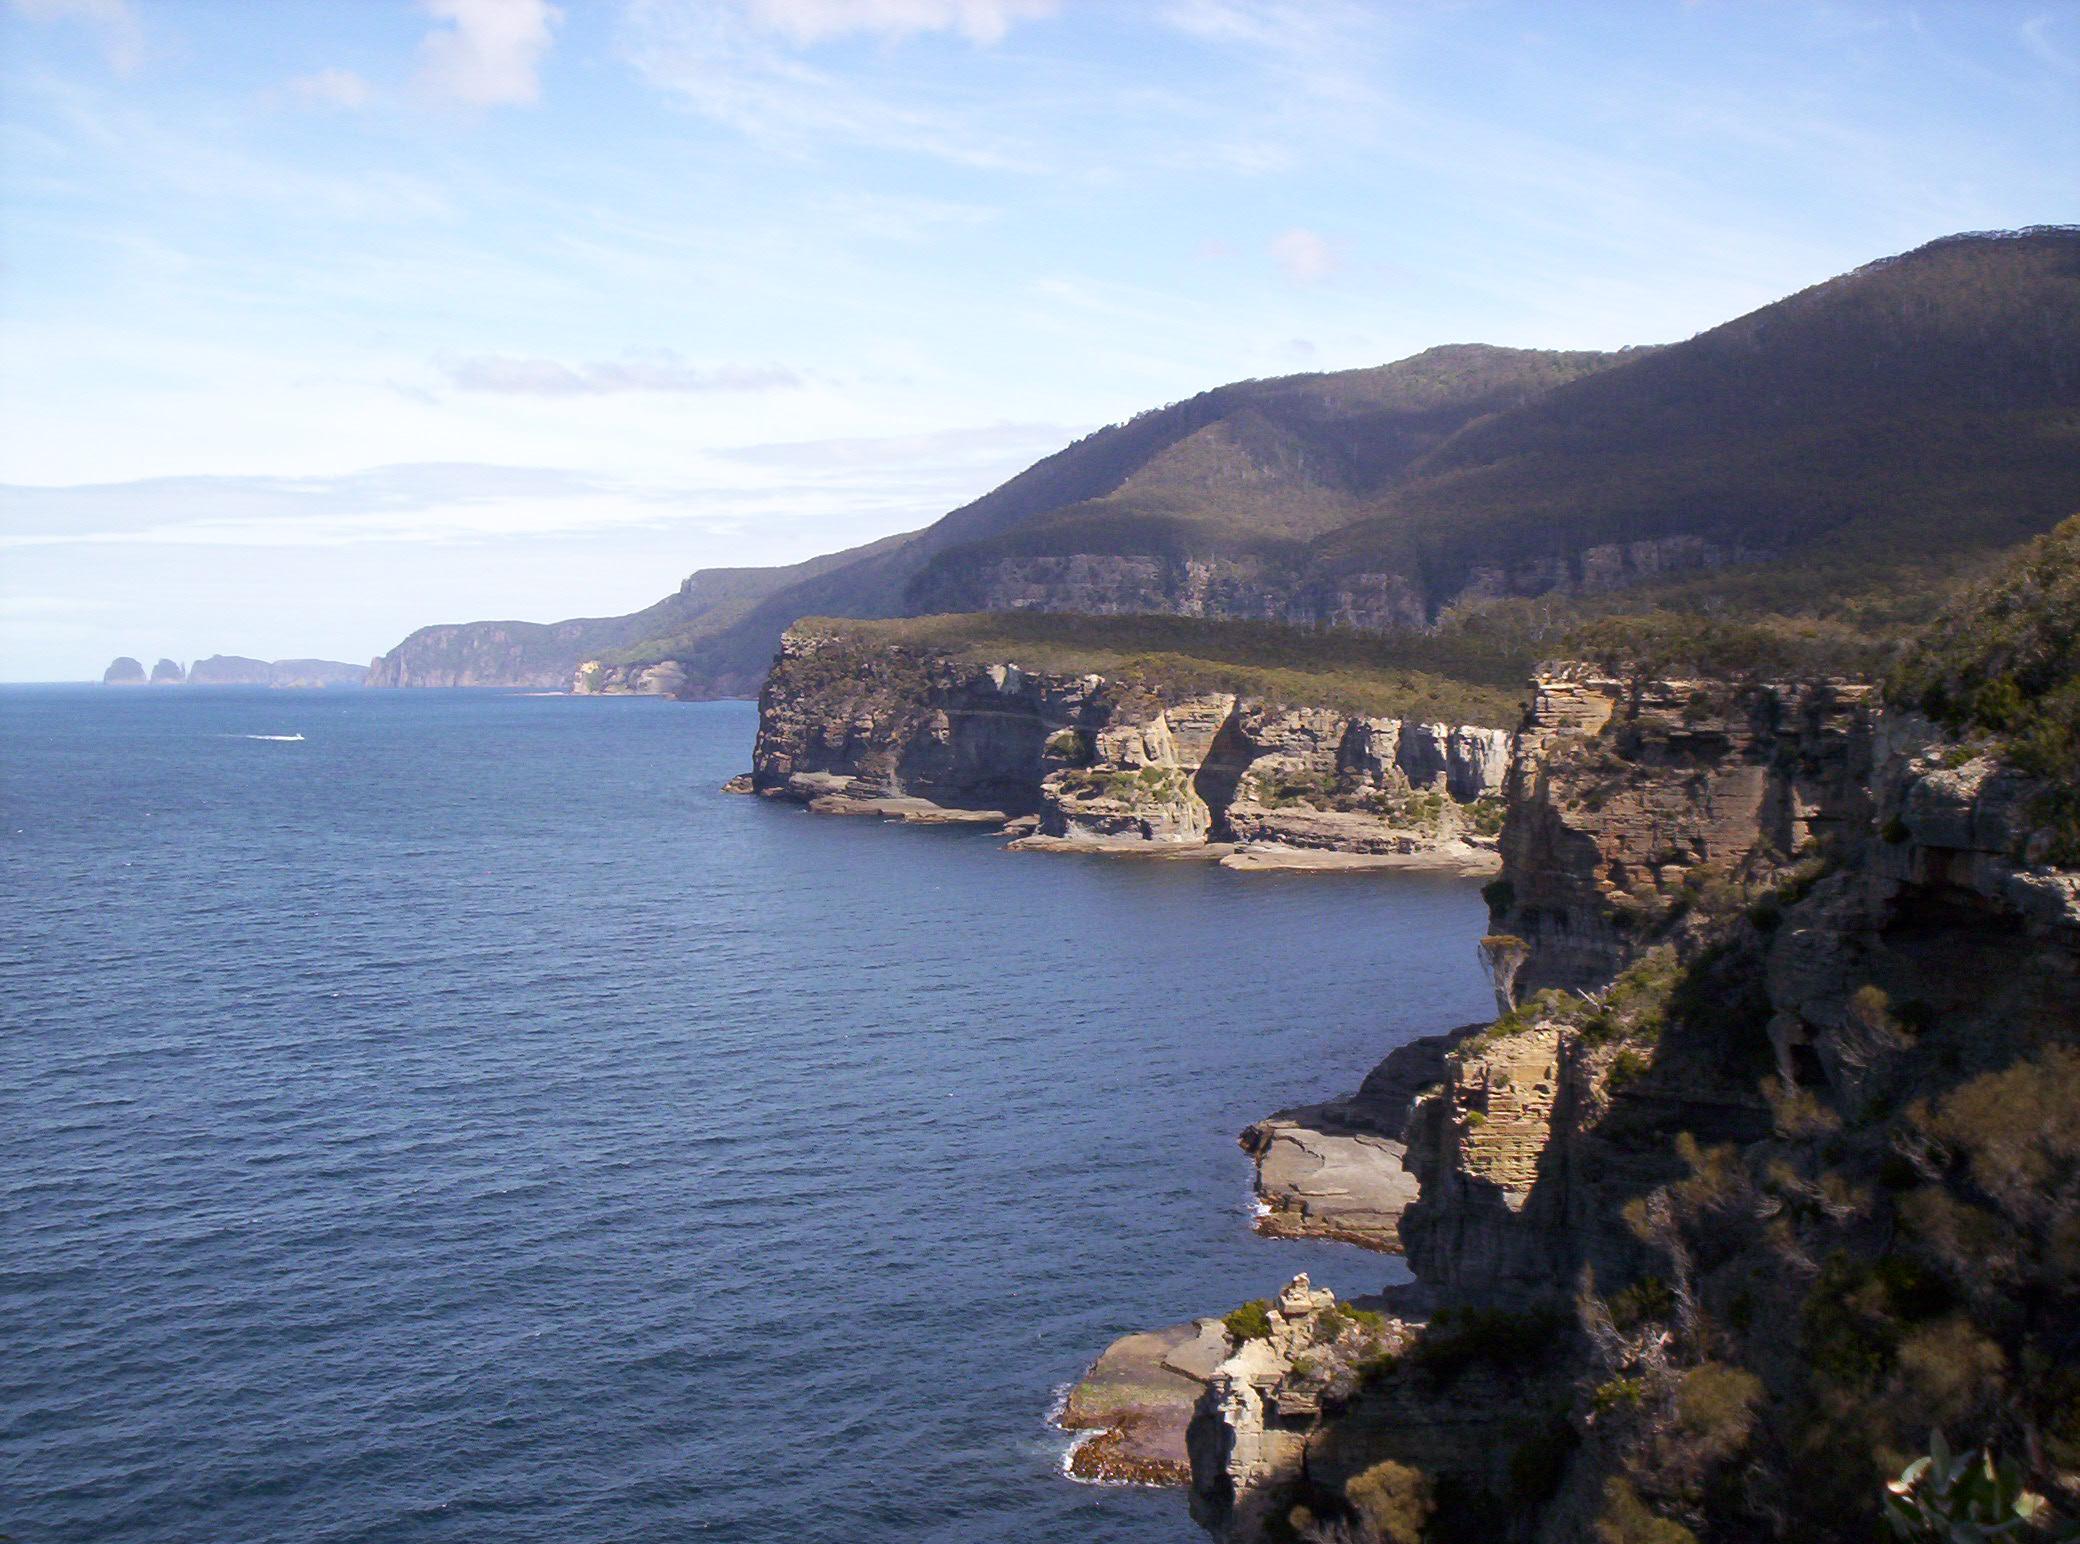 Http Commons Wikimedia Org Wiki File Coastal Cliffs Tasman Peninsula Jpg